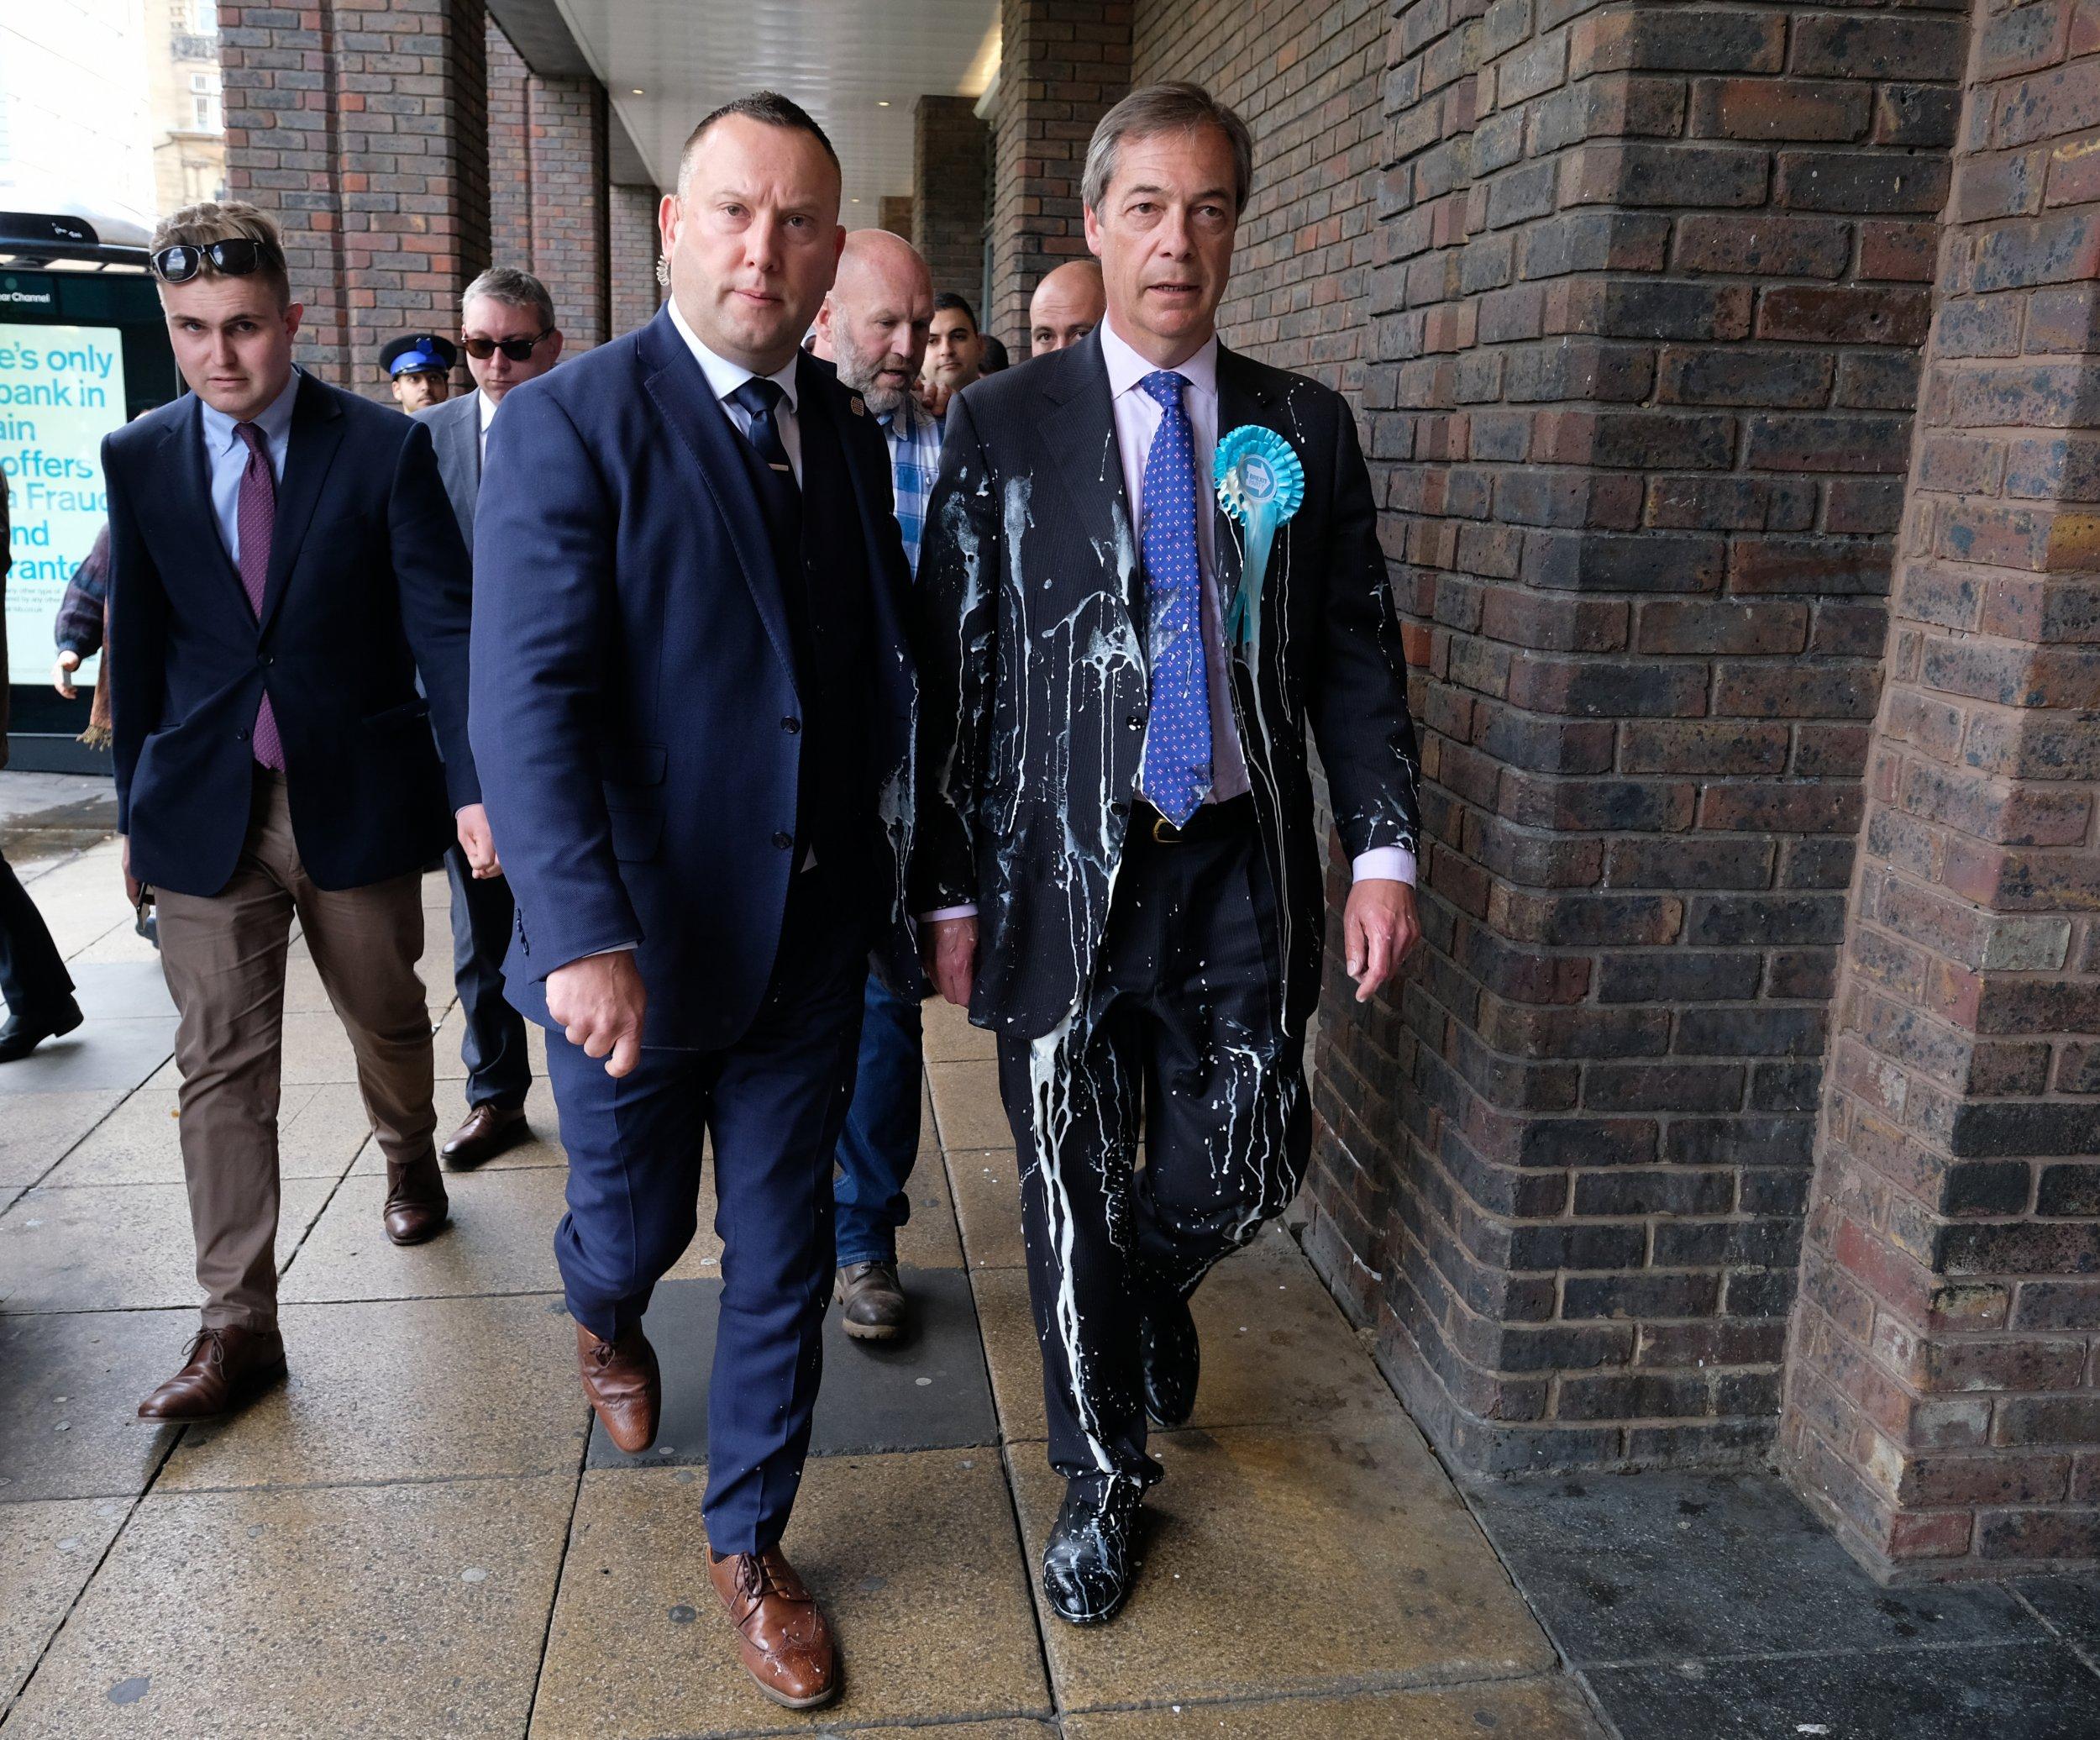 Brexit Nigel Farage milkshake attack